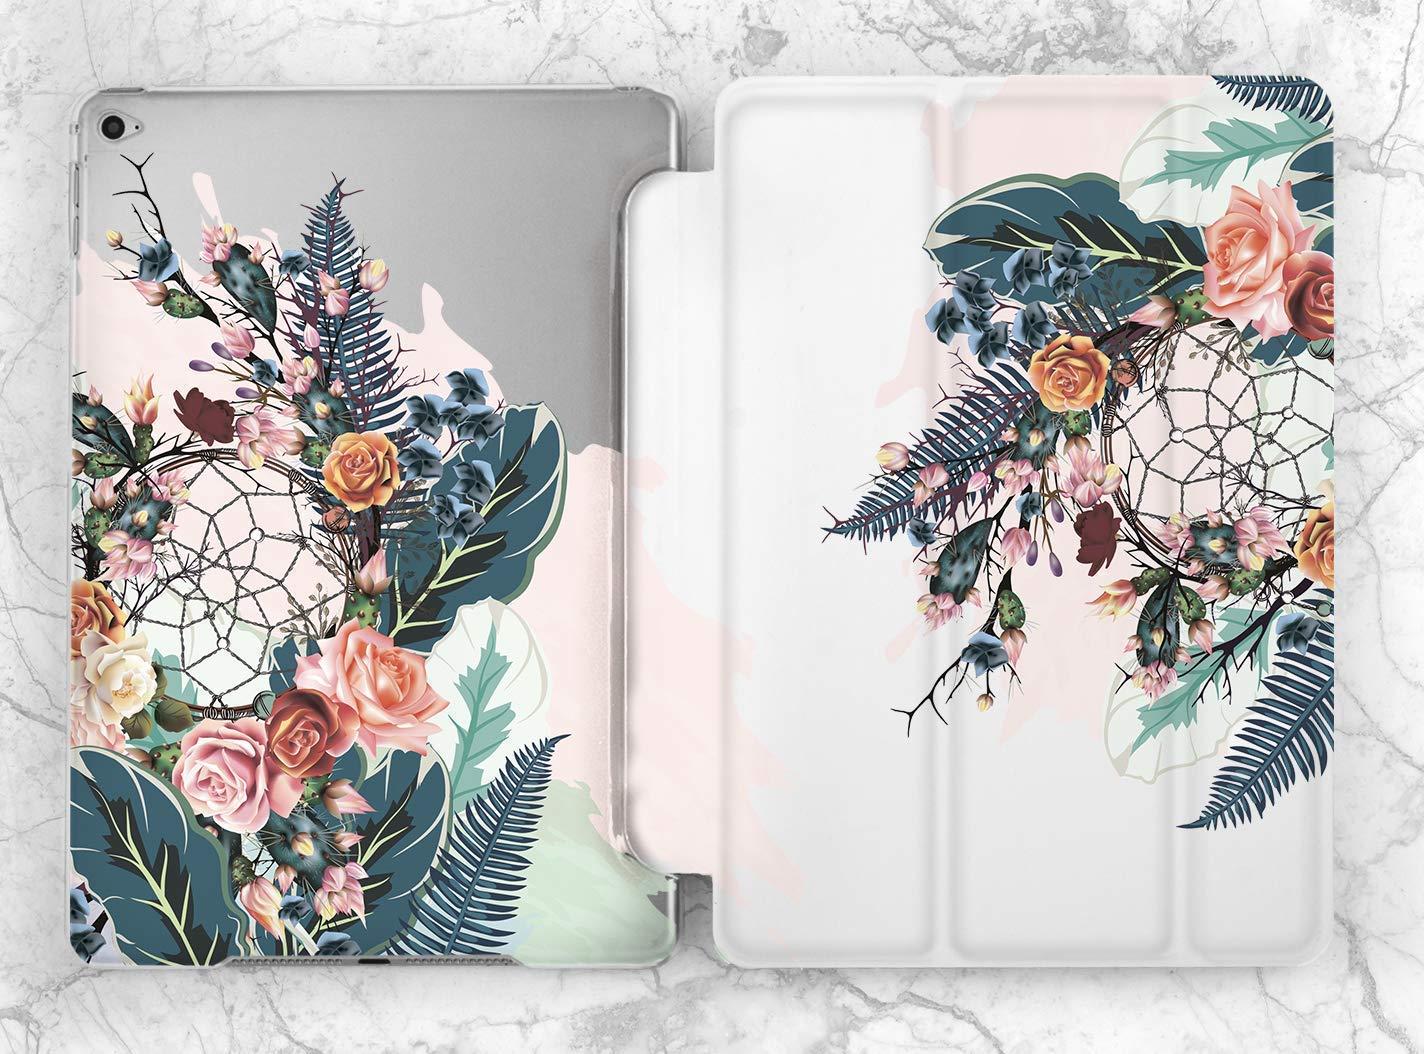 Floral iPad Air 2 3 Smart Cover iPad Mini 4 5 Plastic Case iPad Pro 11 12.9 2018